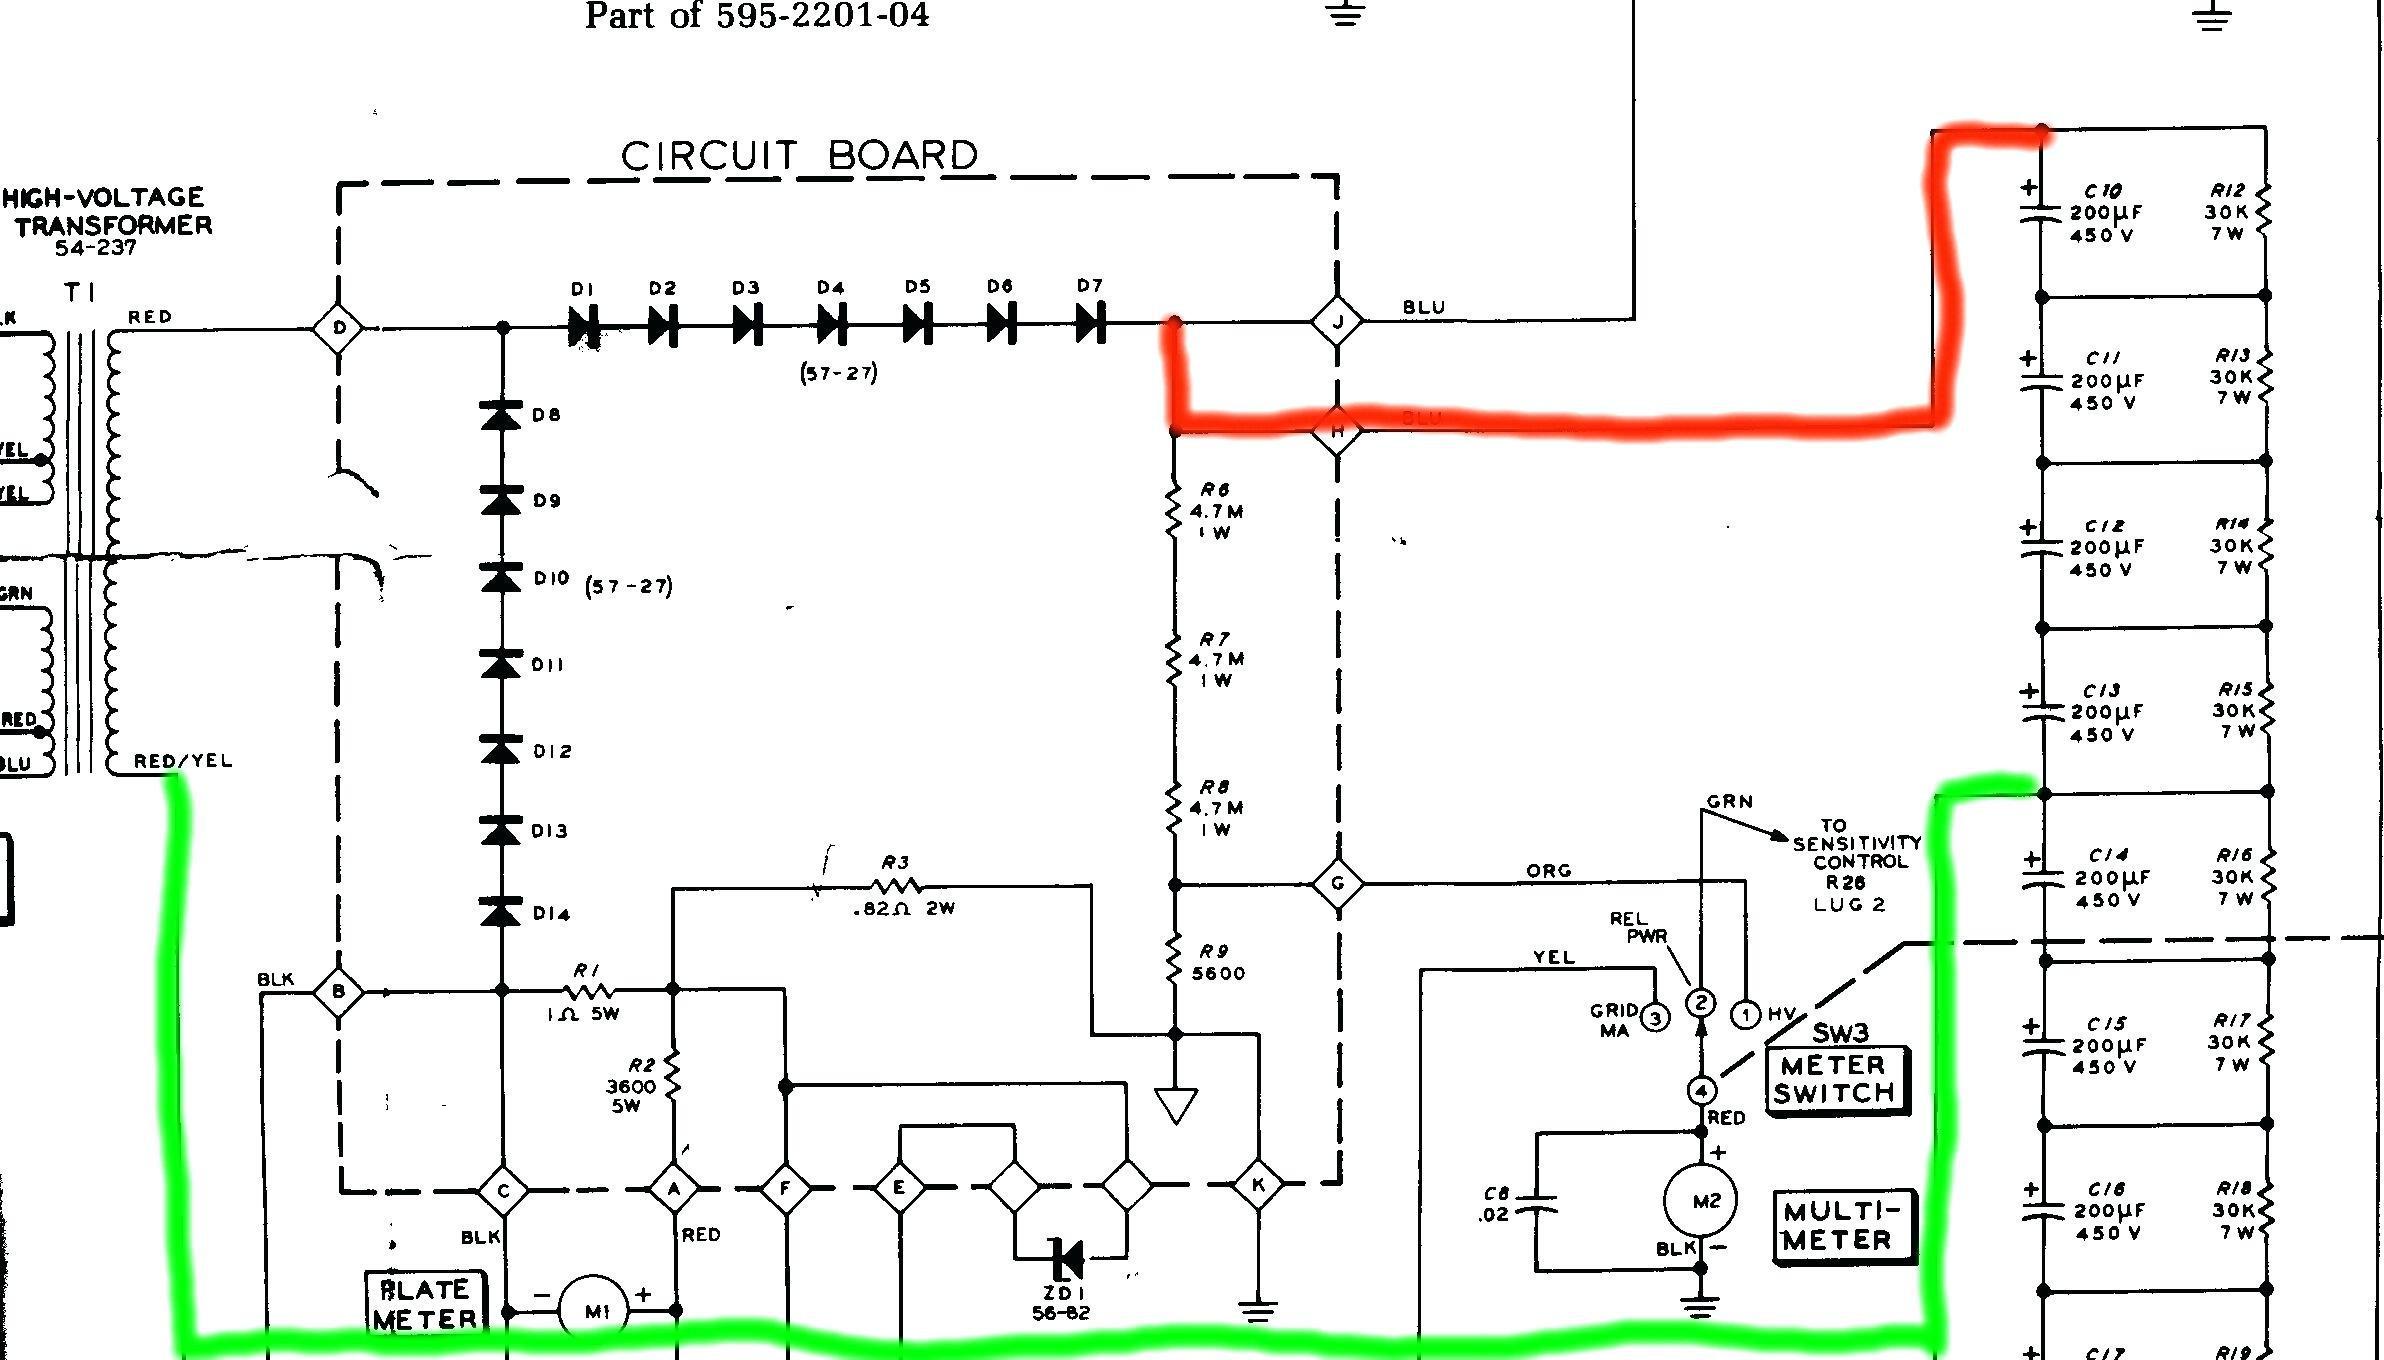 Gfci Breaker Wiring Diagram Best 220V Hot Tub Wiring Diagram Awesome - Gfci Breaker Wiring Diagram